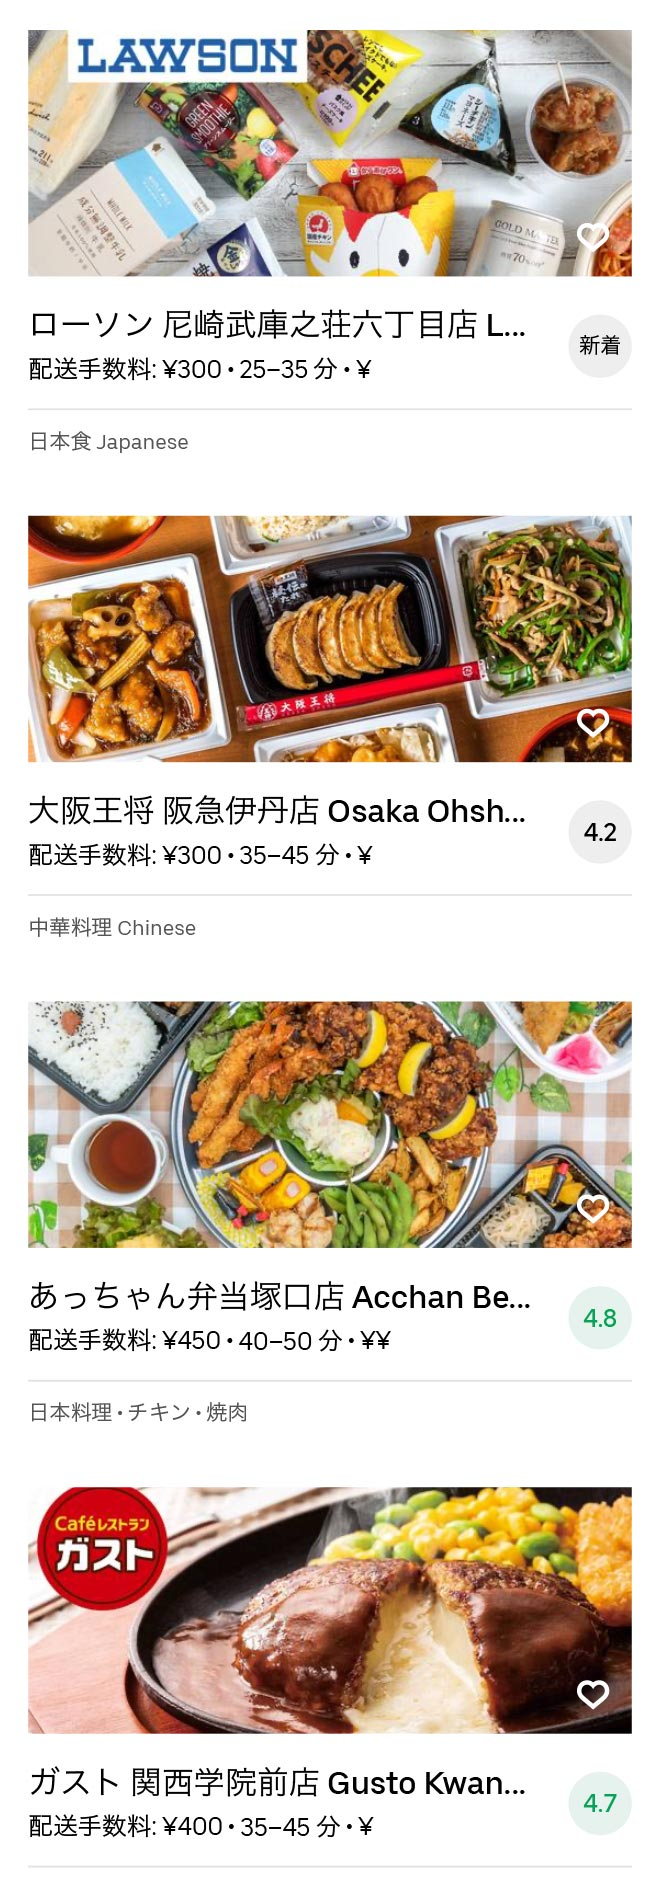 Itami sakuradai menu 2007 02